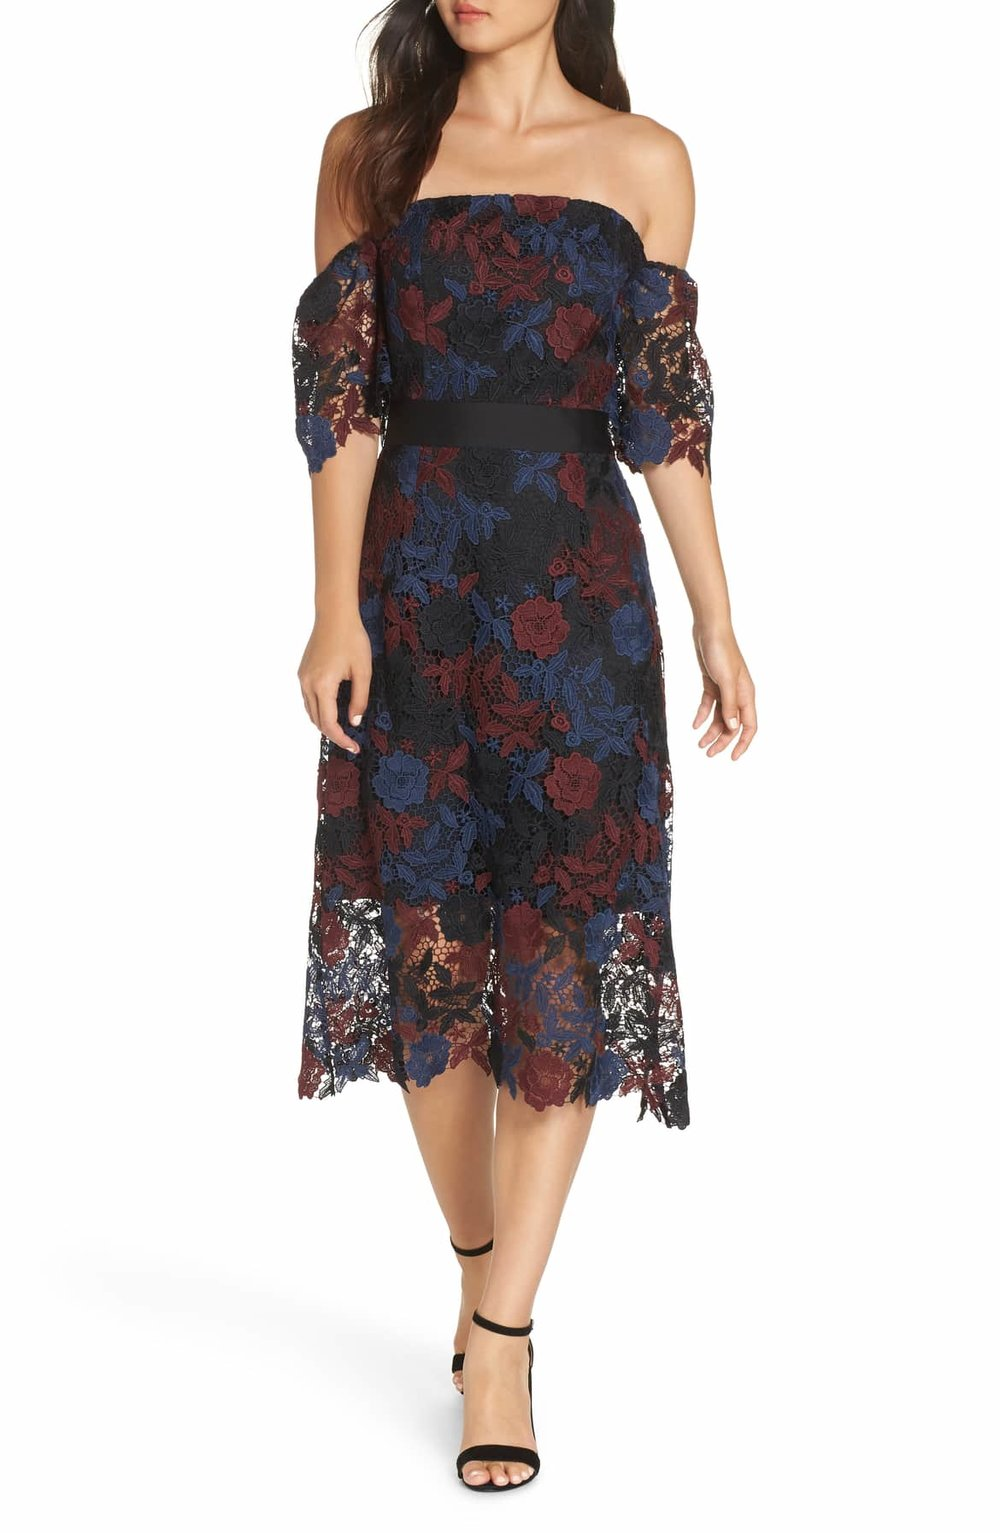 Sam Edelman Three-toned Off the Shoulder Lace Midi Dress - $158.00